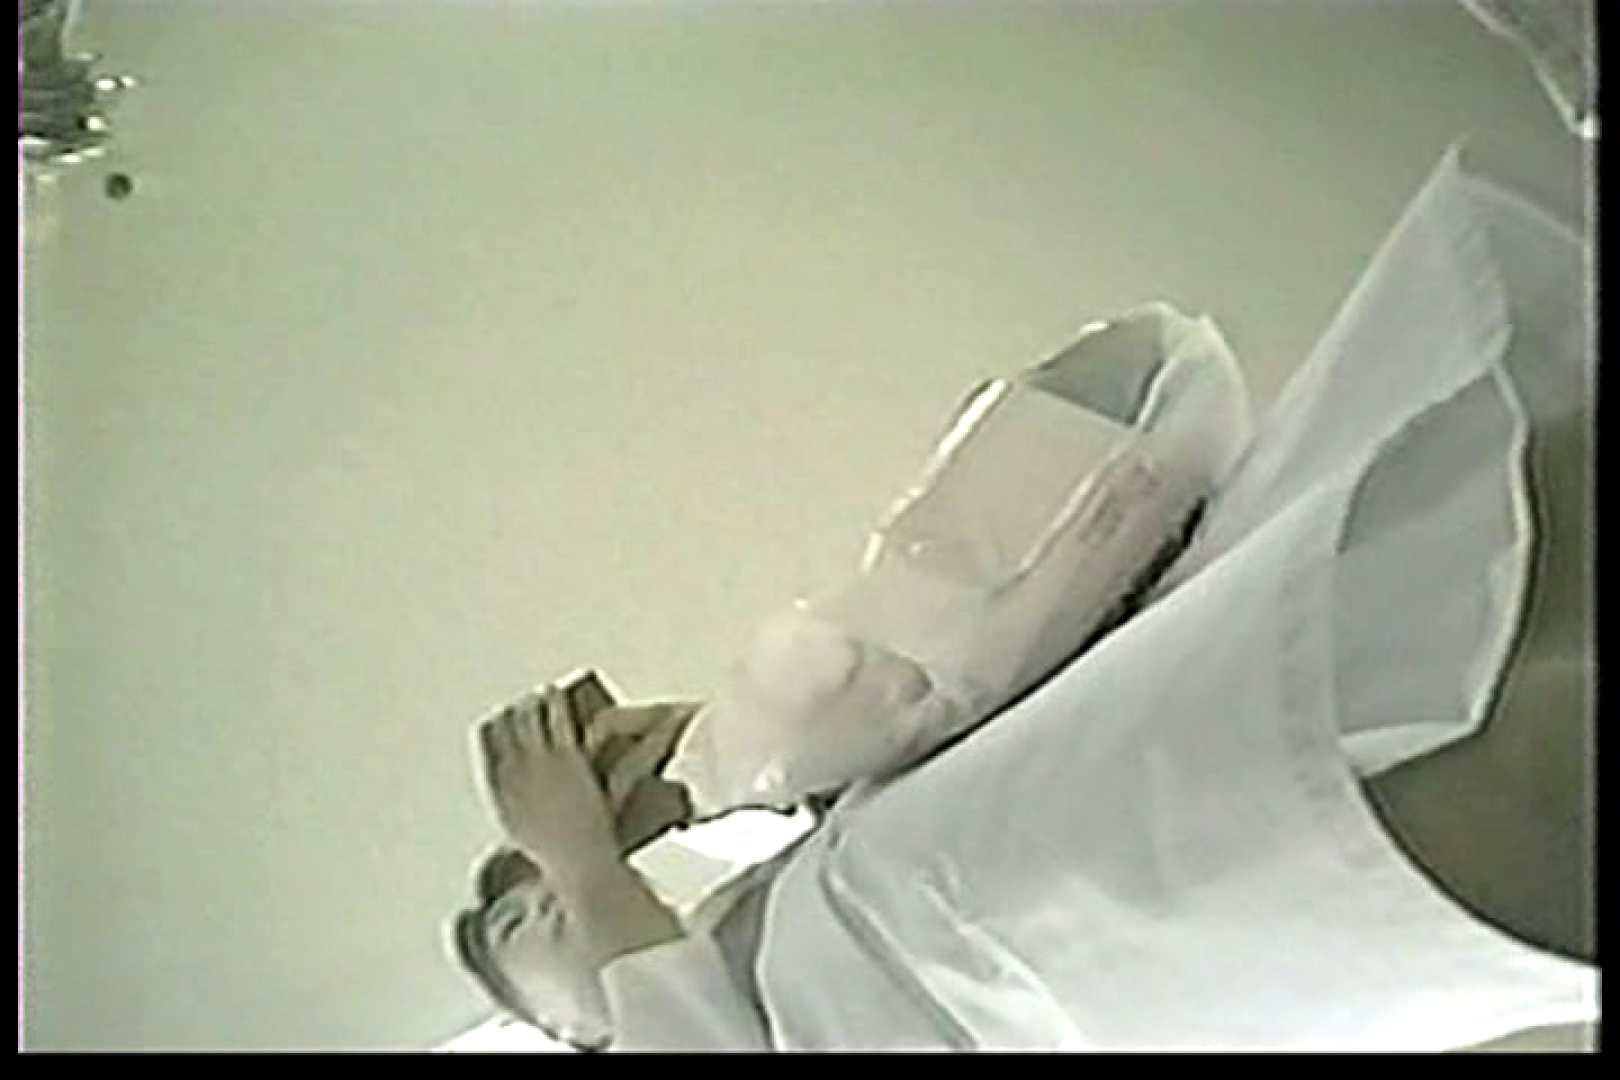 院内密着!看護婦達の下半身事情Vol.3 OLエロ画像  112PICs 80